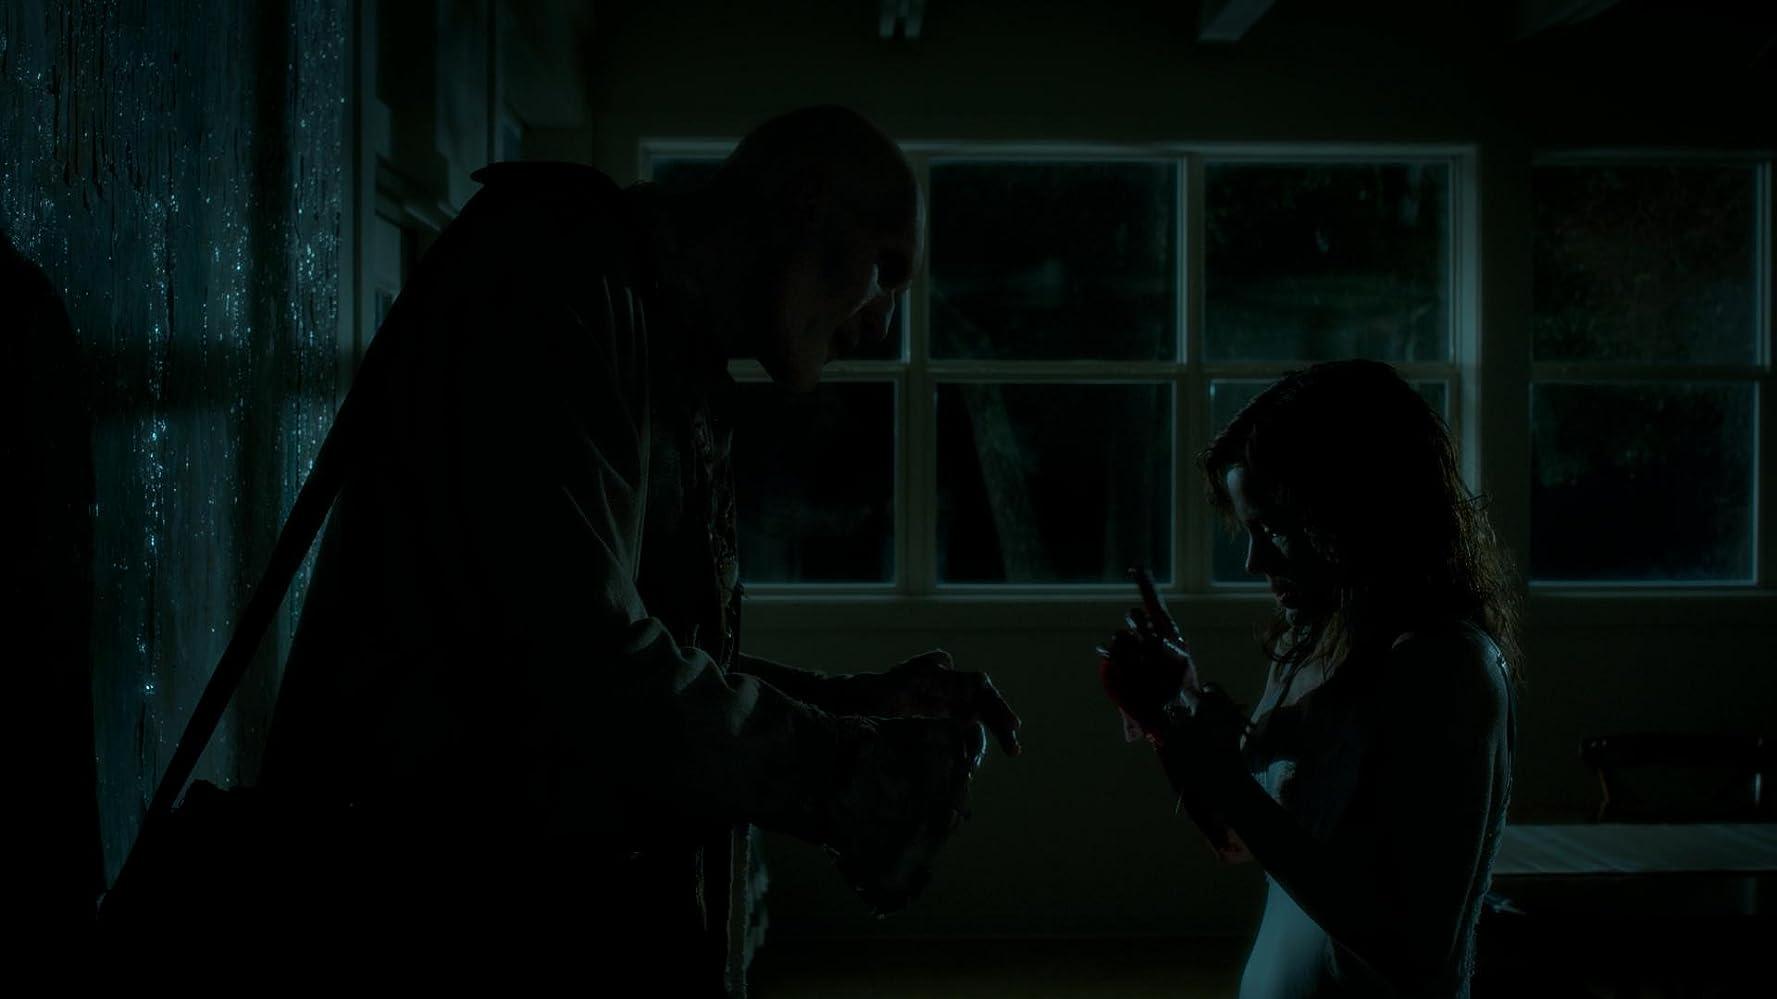 Carla Gugino and Carel Struycken in Gerald's Game (2017)